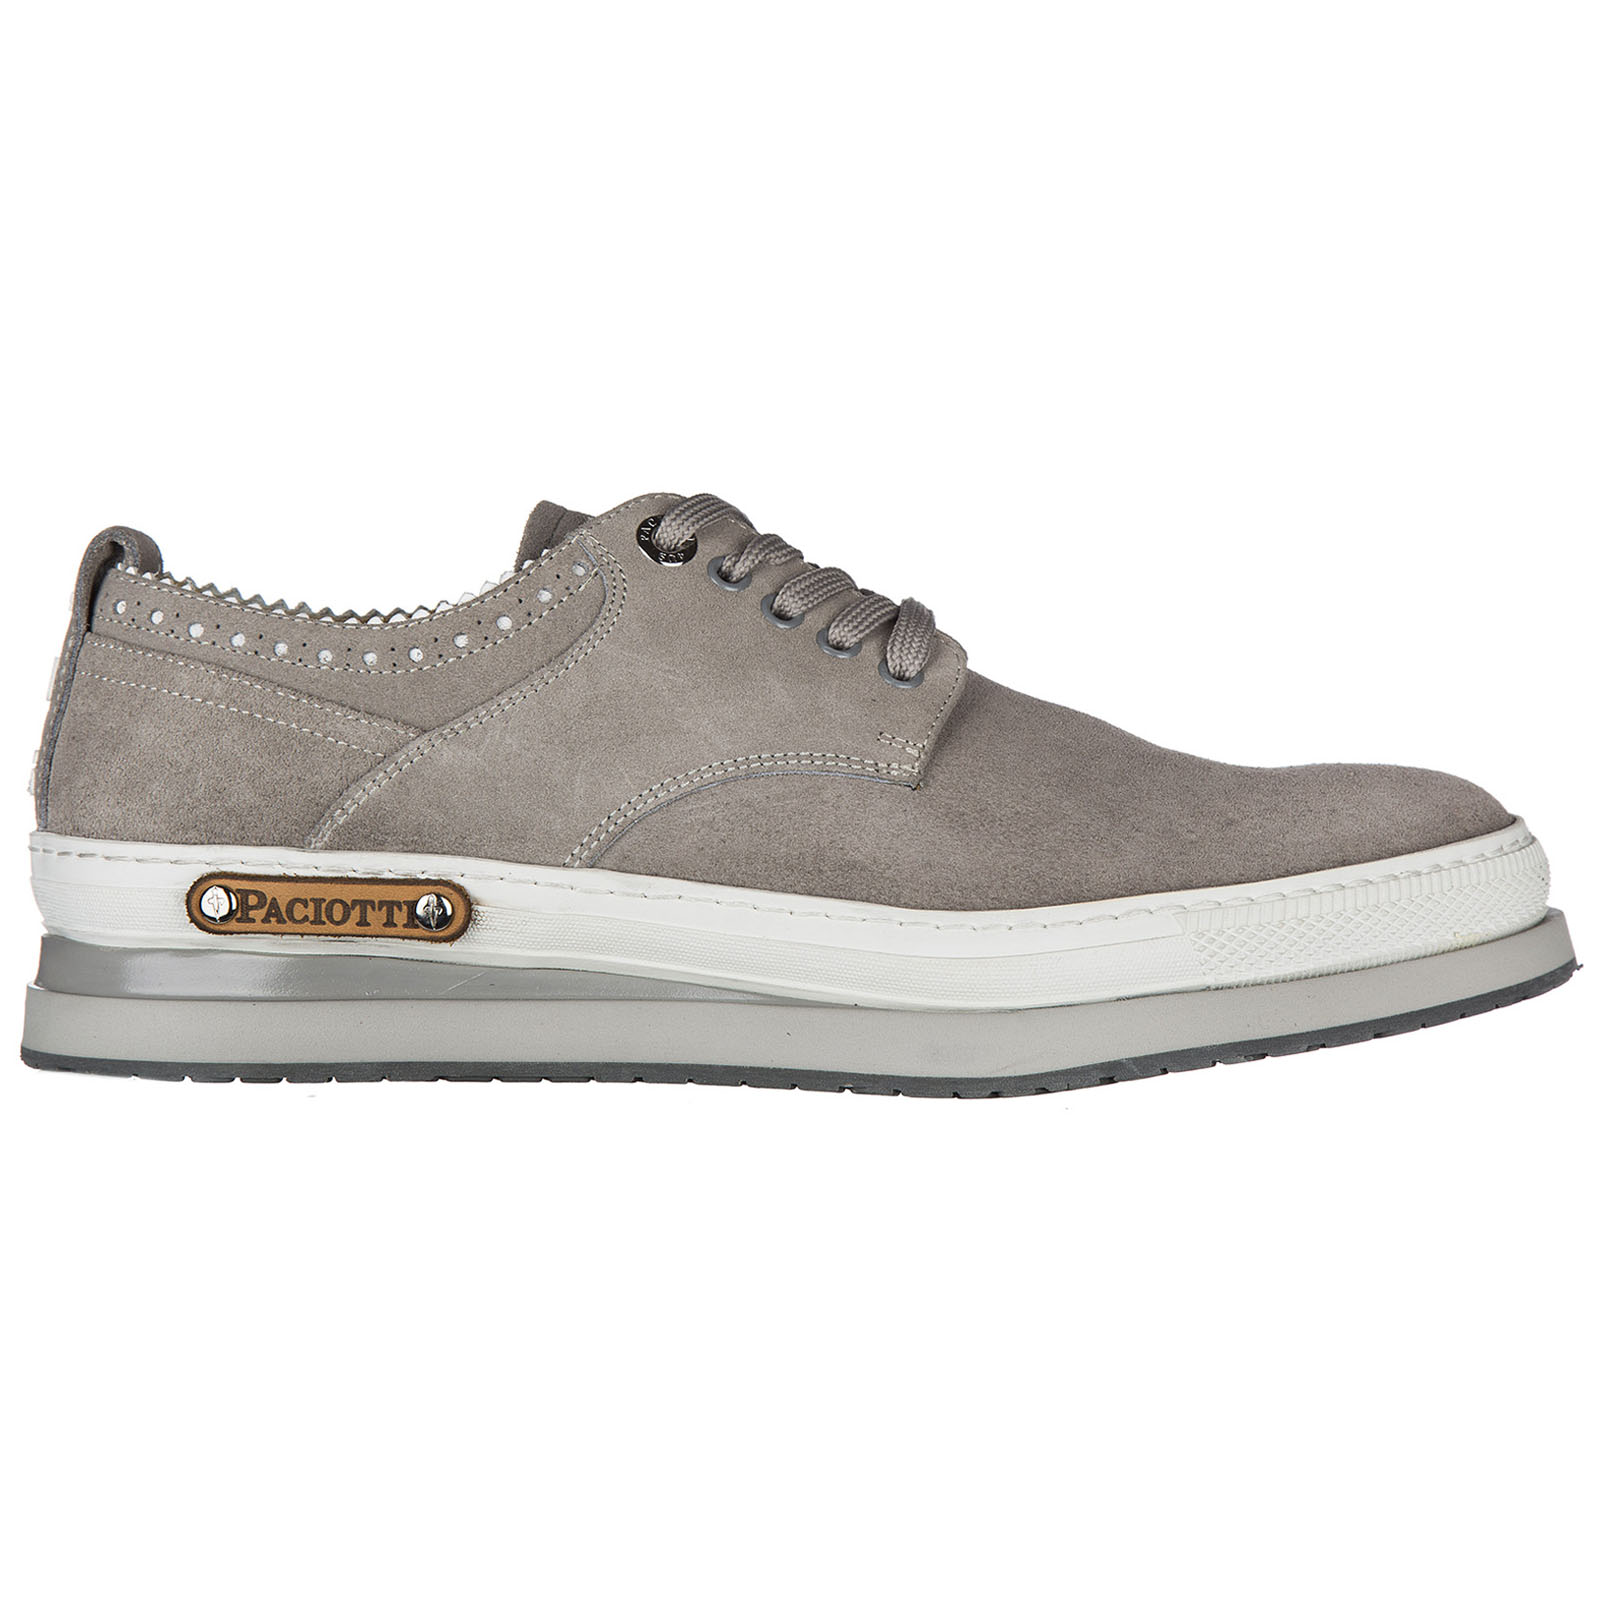 Scarpe sneakers uomo camoscio cannes